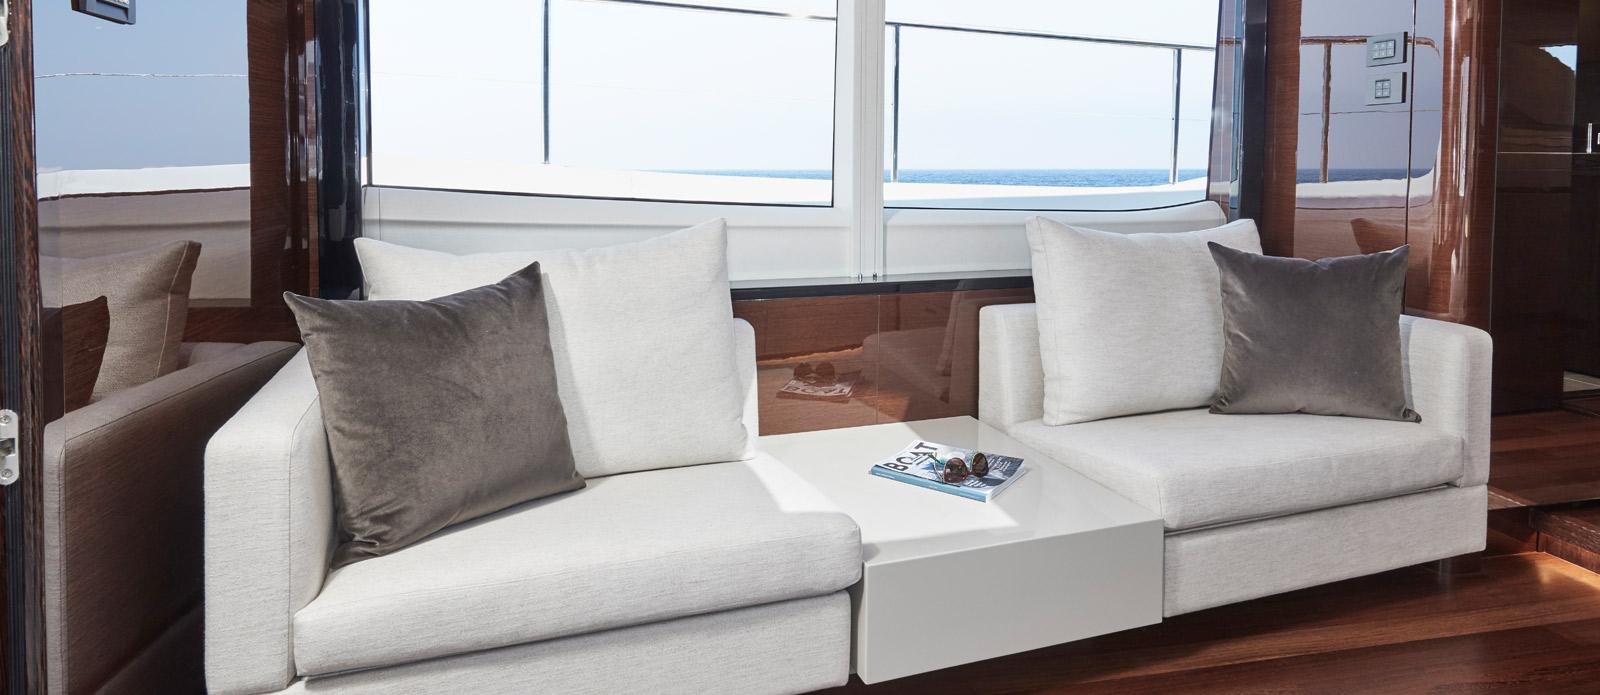 Princess 30 Metre Yacht Bandazul - Master Cabin Sofa